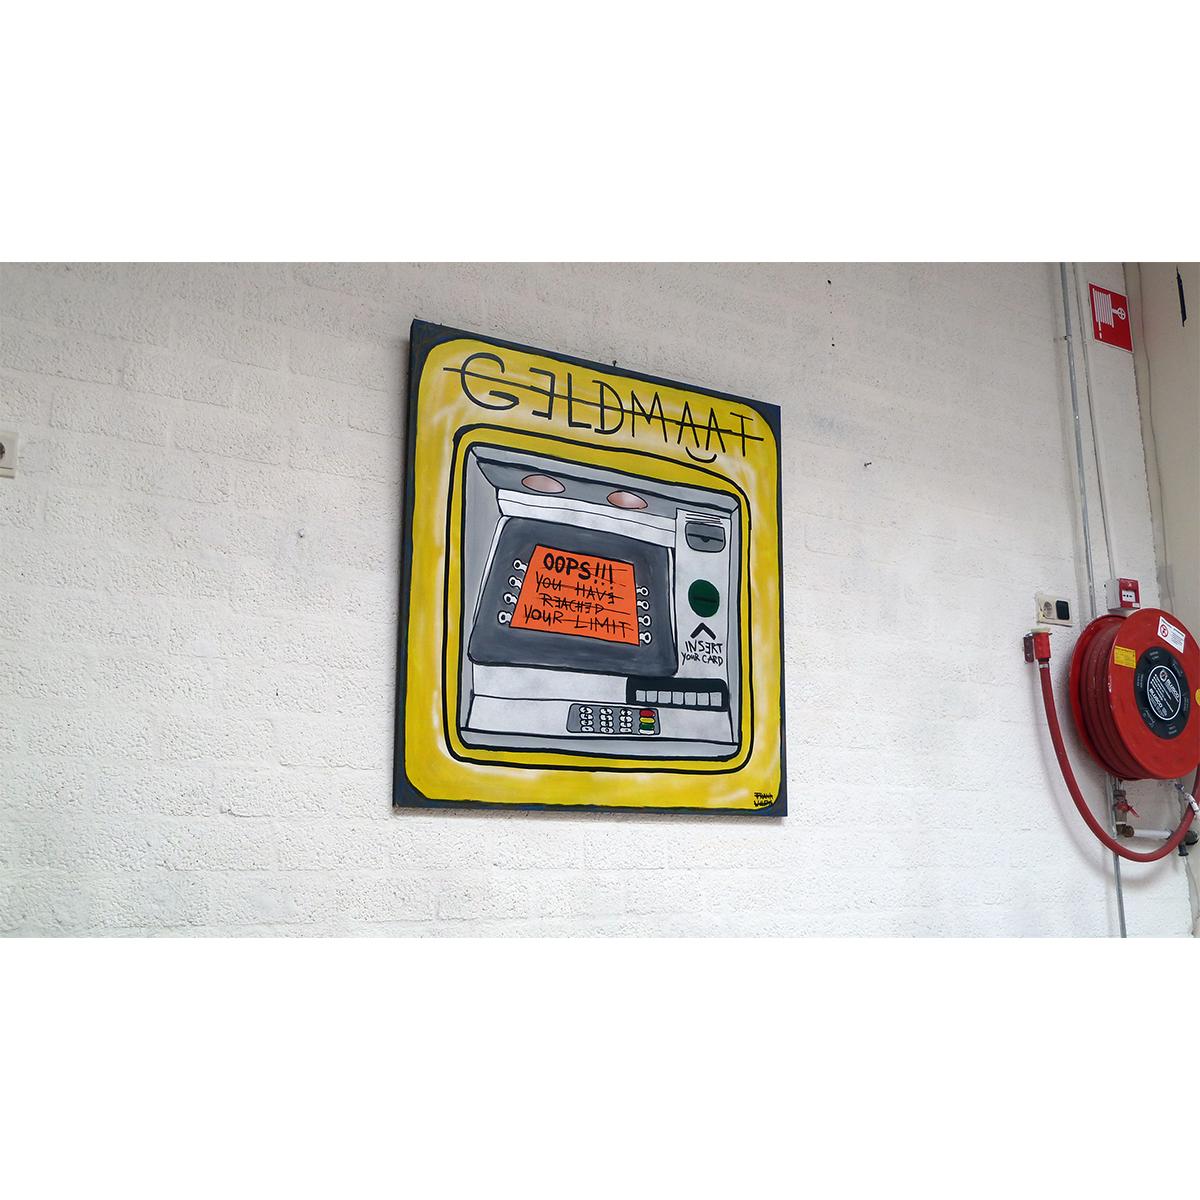 ATM 01 - Frank Willems